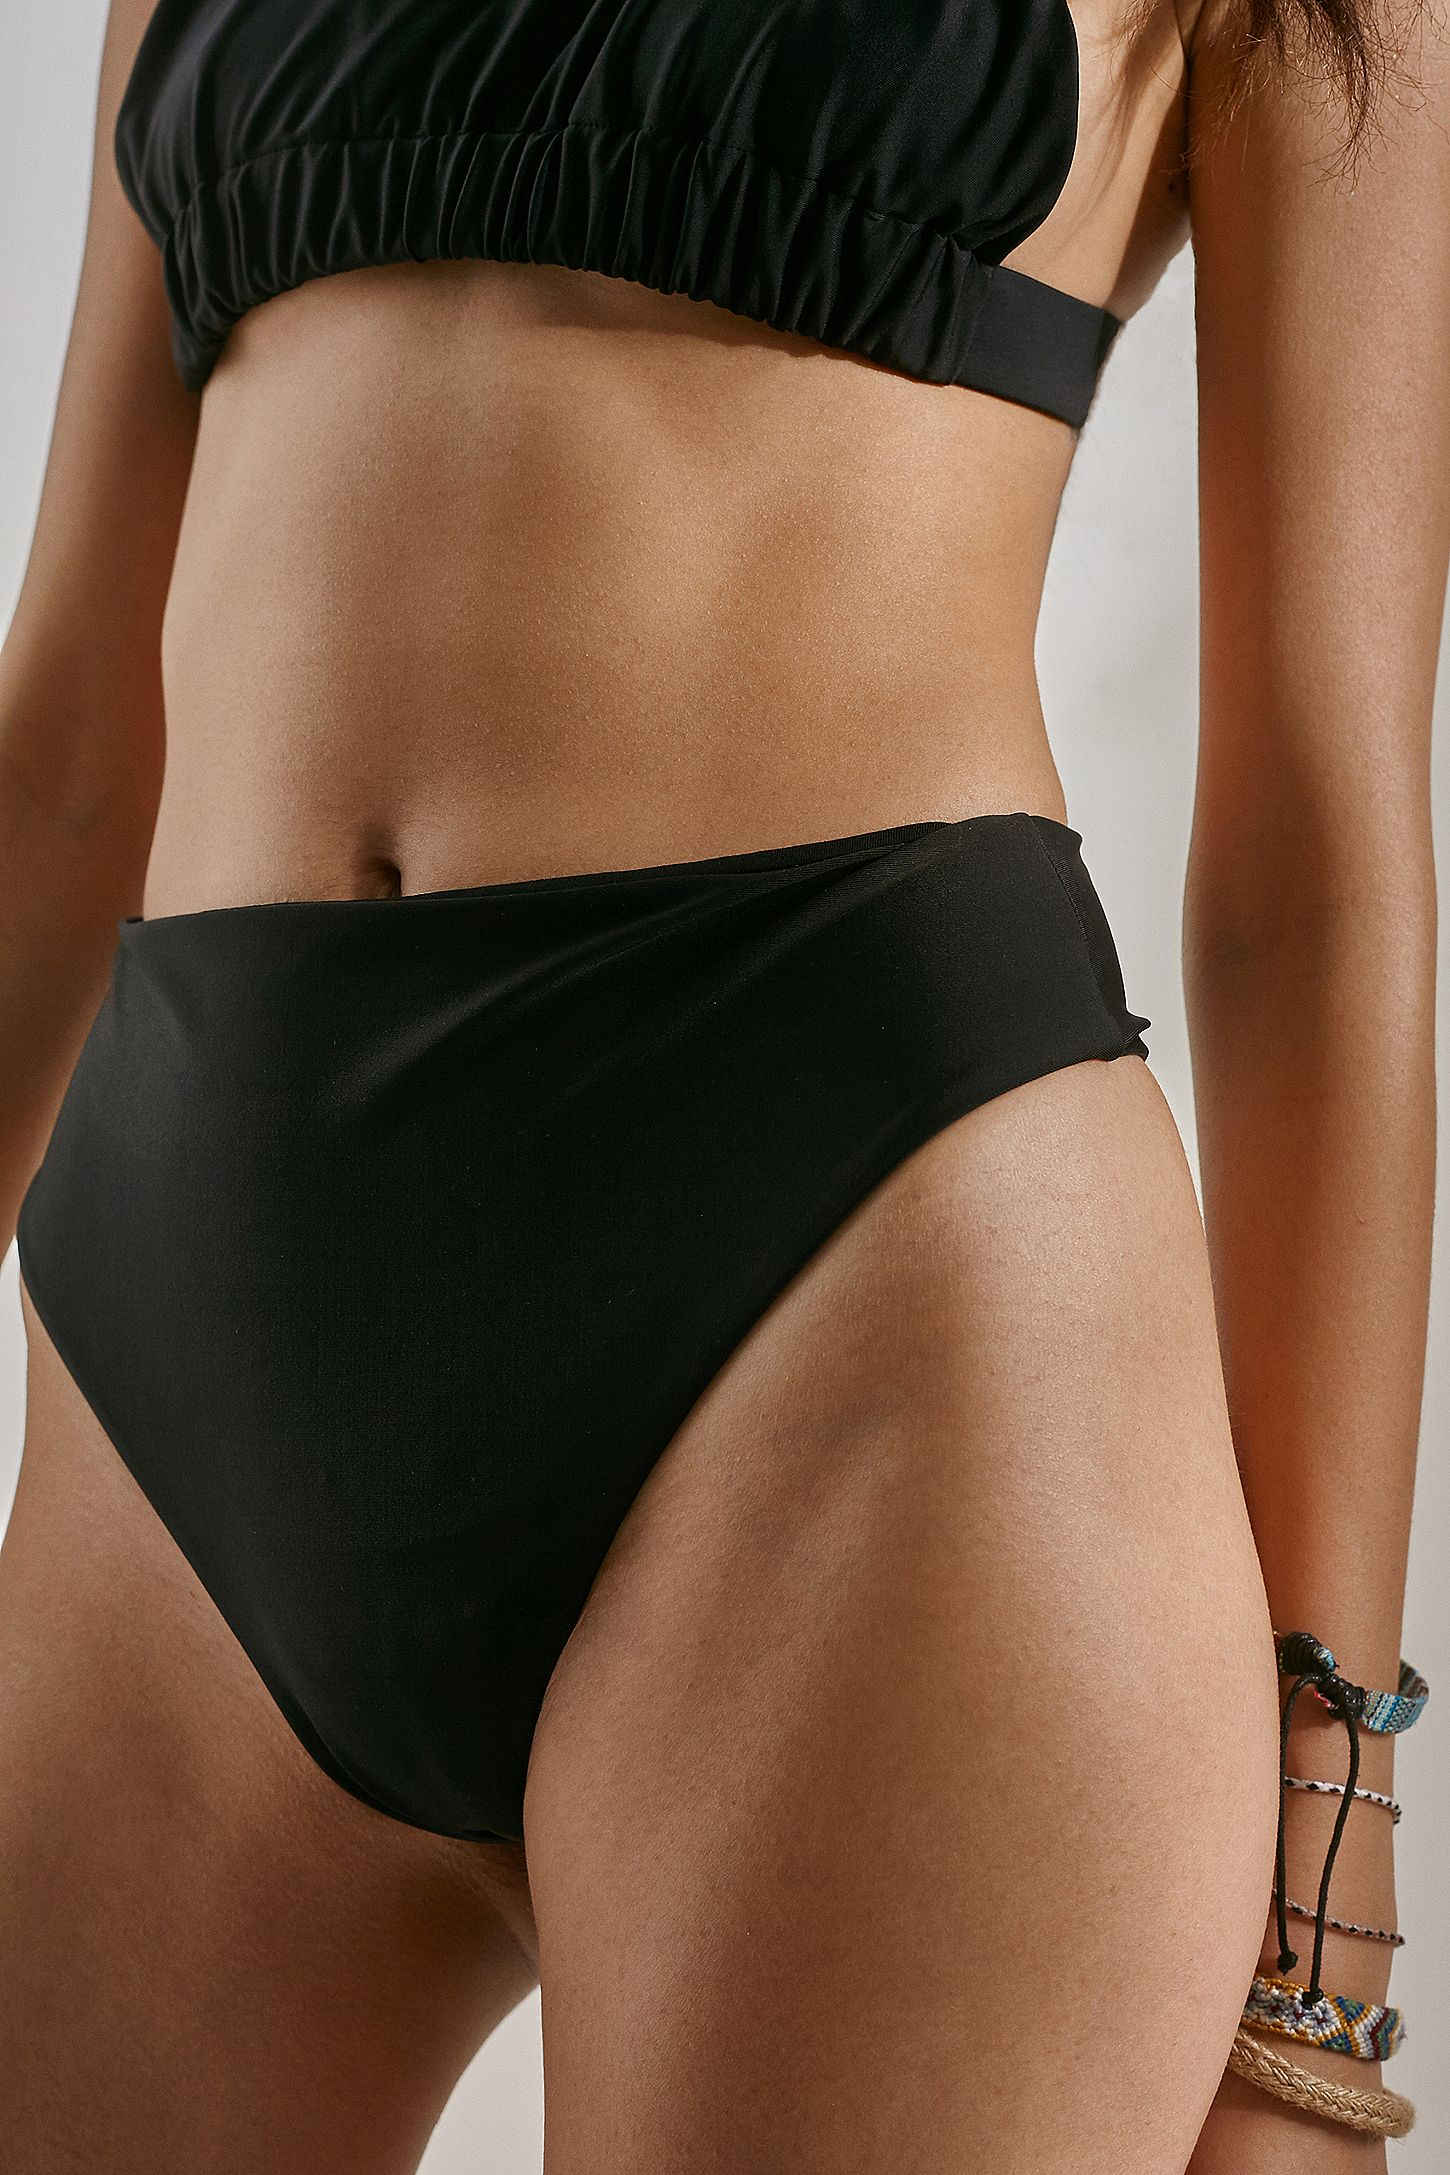 763d480182b We Are We Wear ECO Selin High-Rise Thong Bikini Bottoms | Urban ...